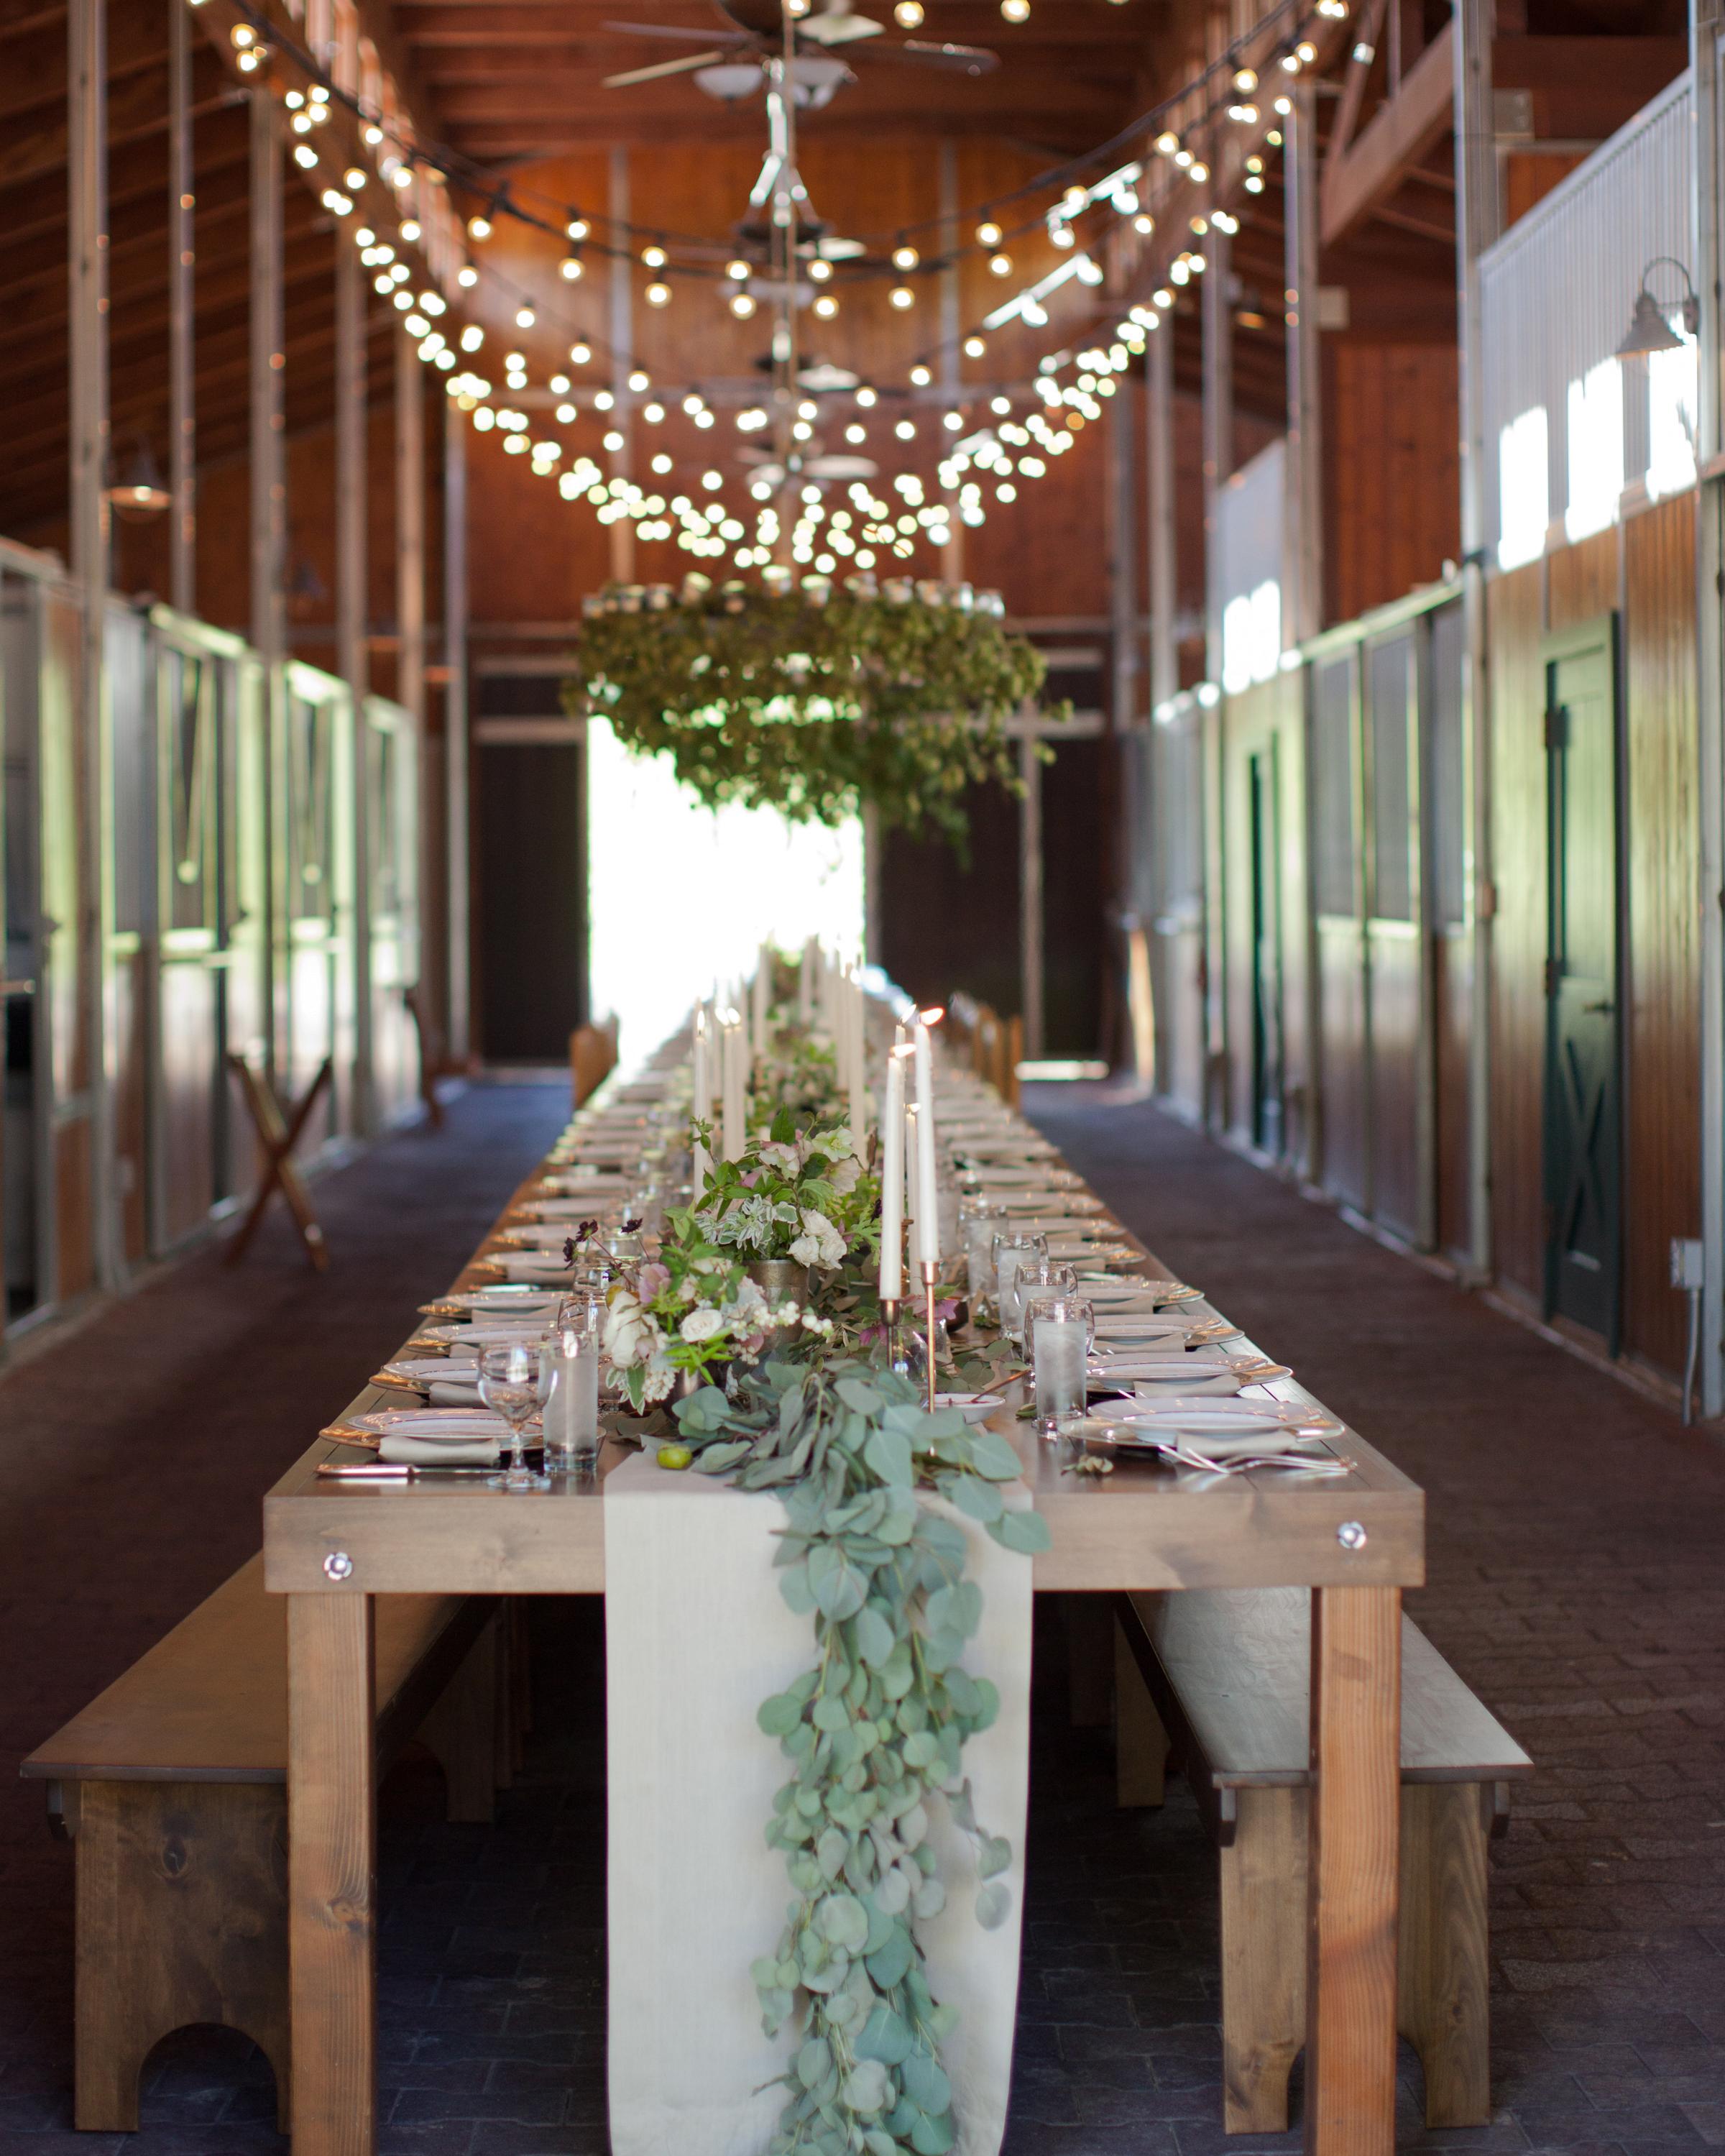 lizzy-pat-wedding-table-160-s111777-0115.jpg